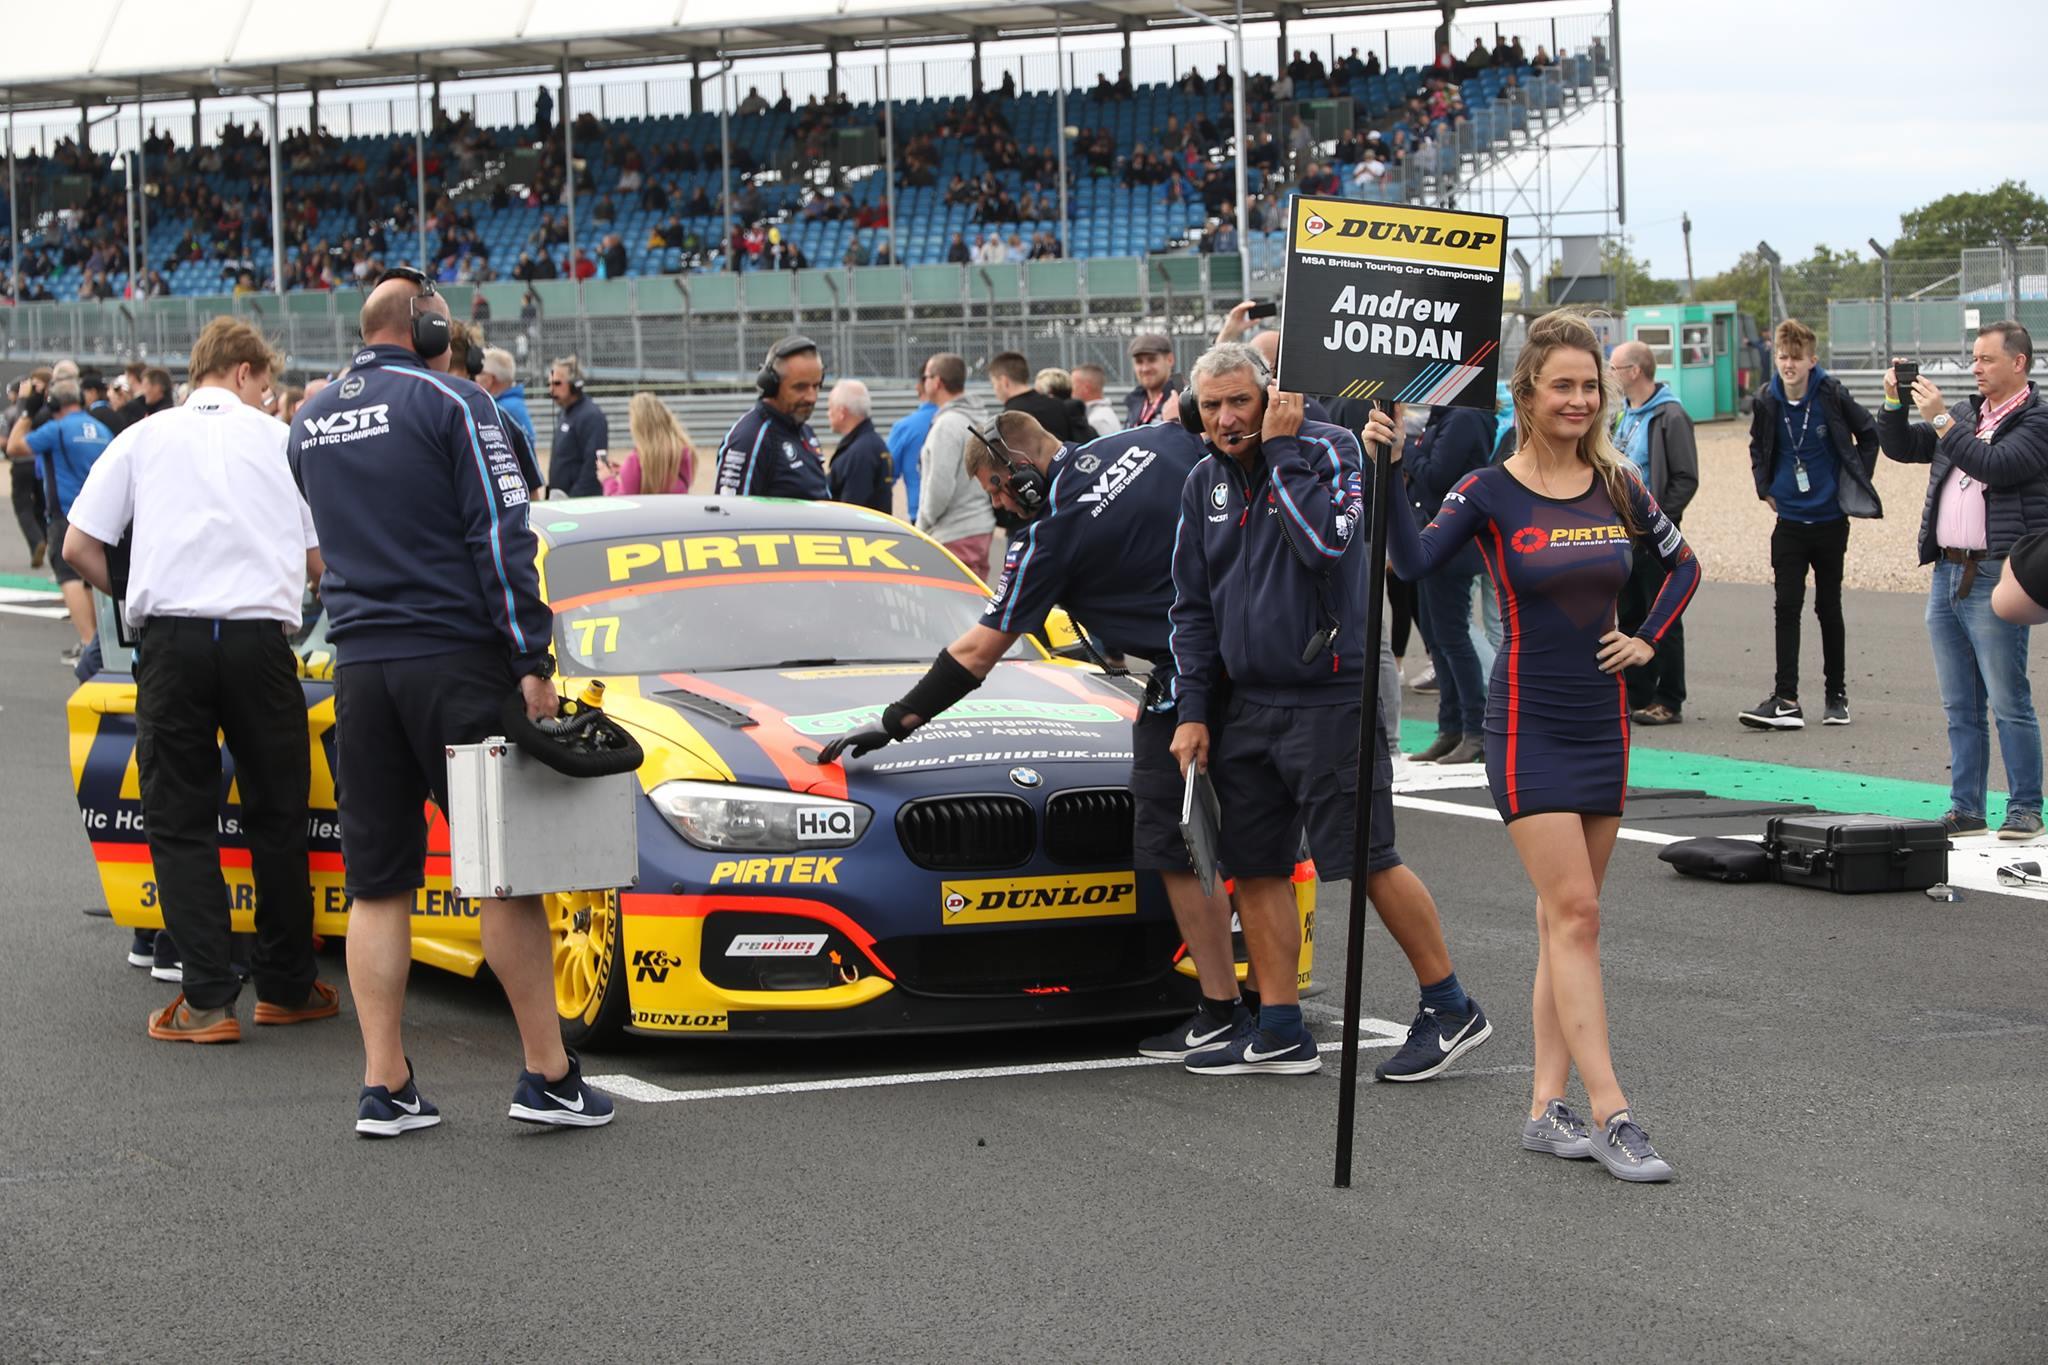 BMW Pirtek Racing BTCC at Silverstone BTCC – 16th September